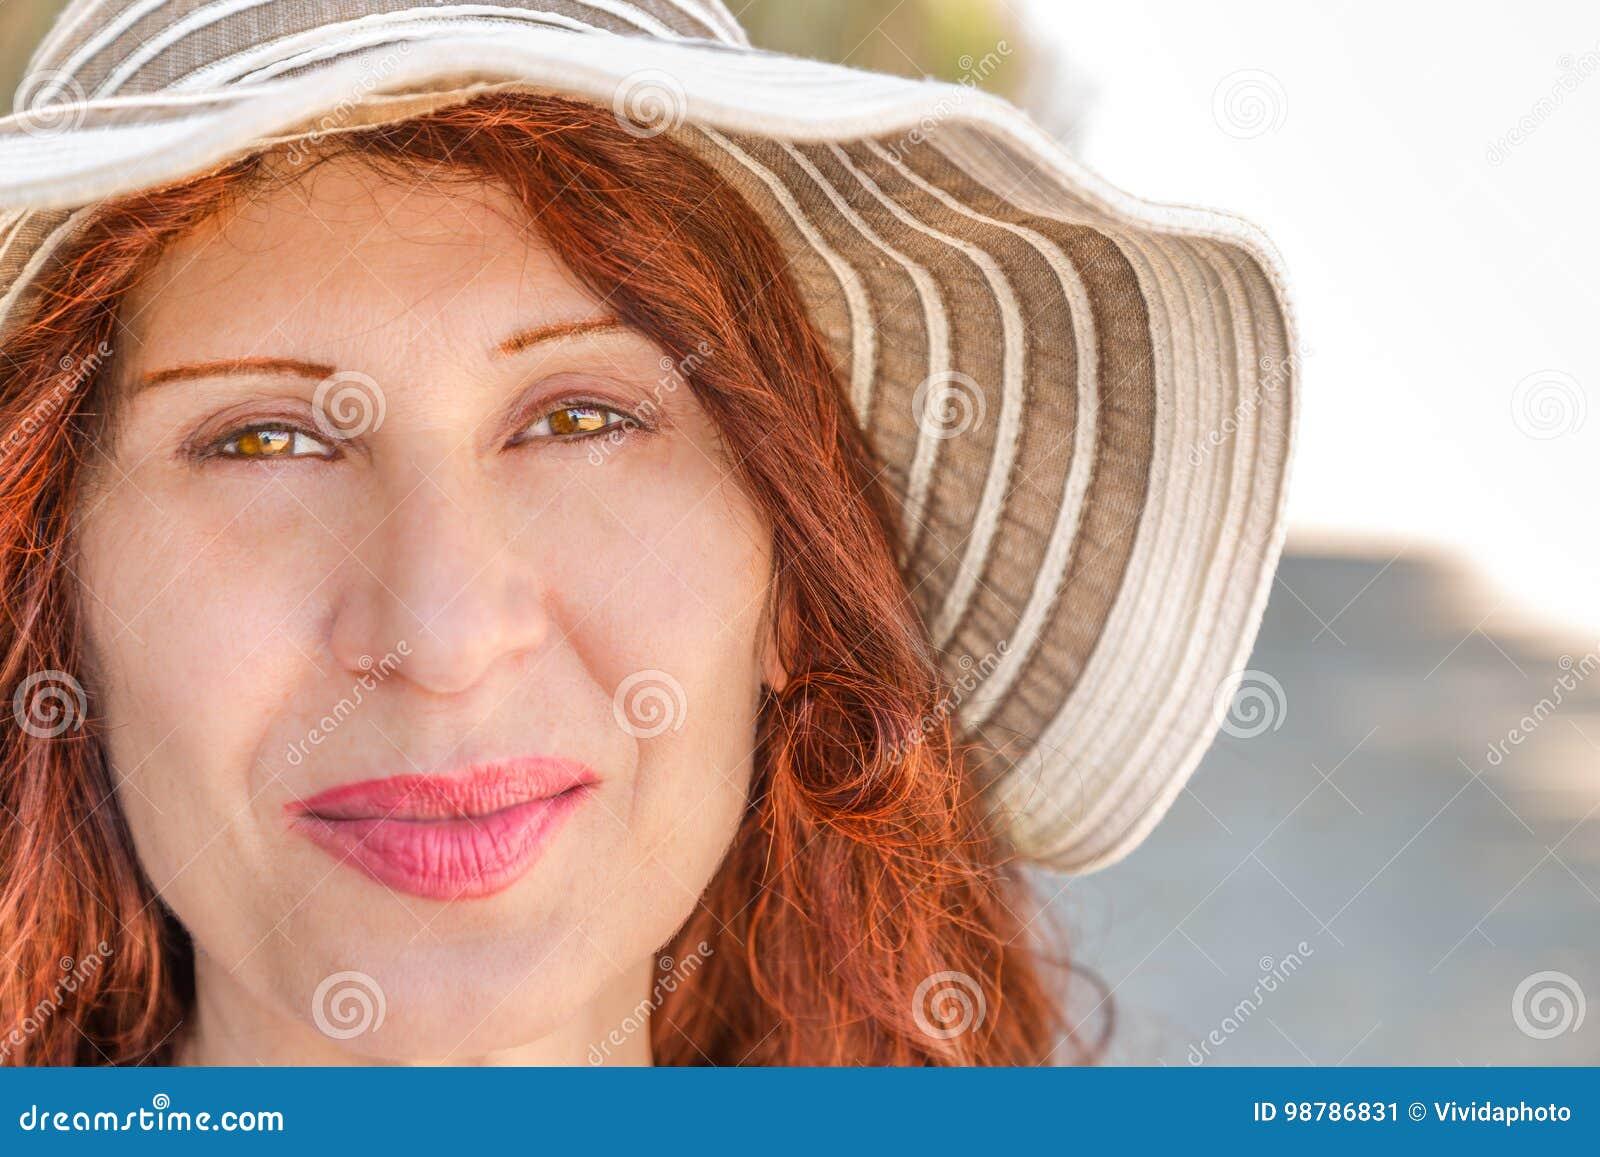 Mature women in panty hose